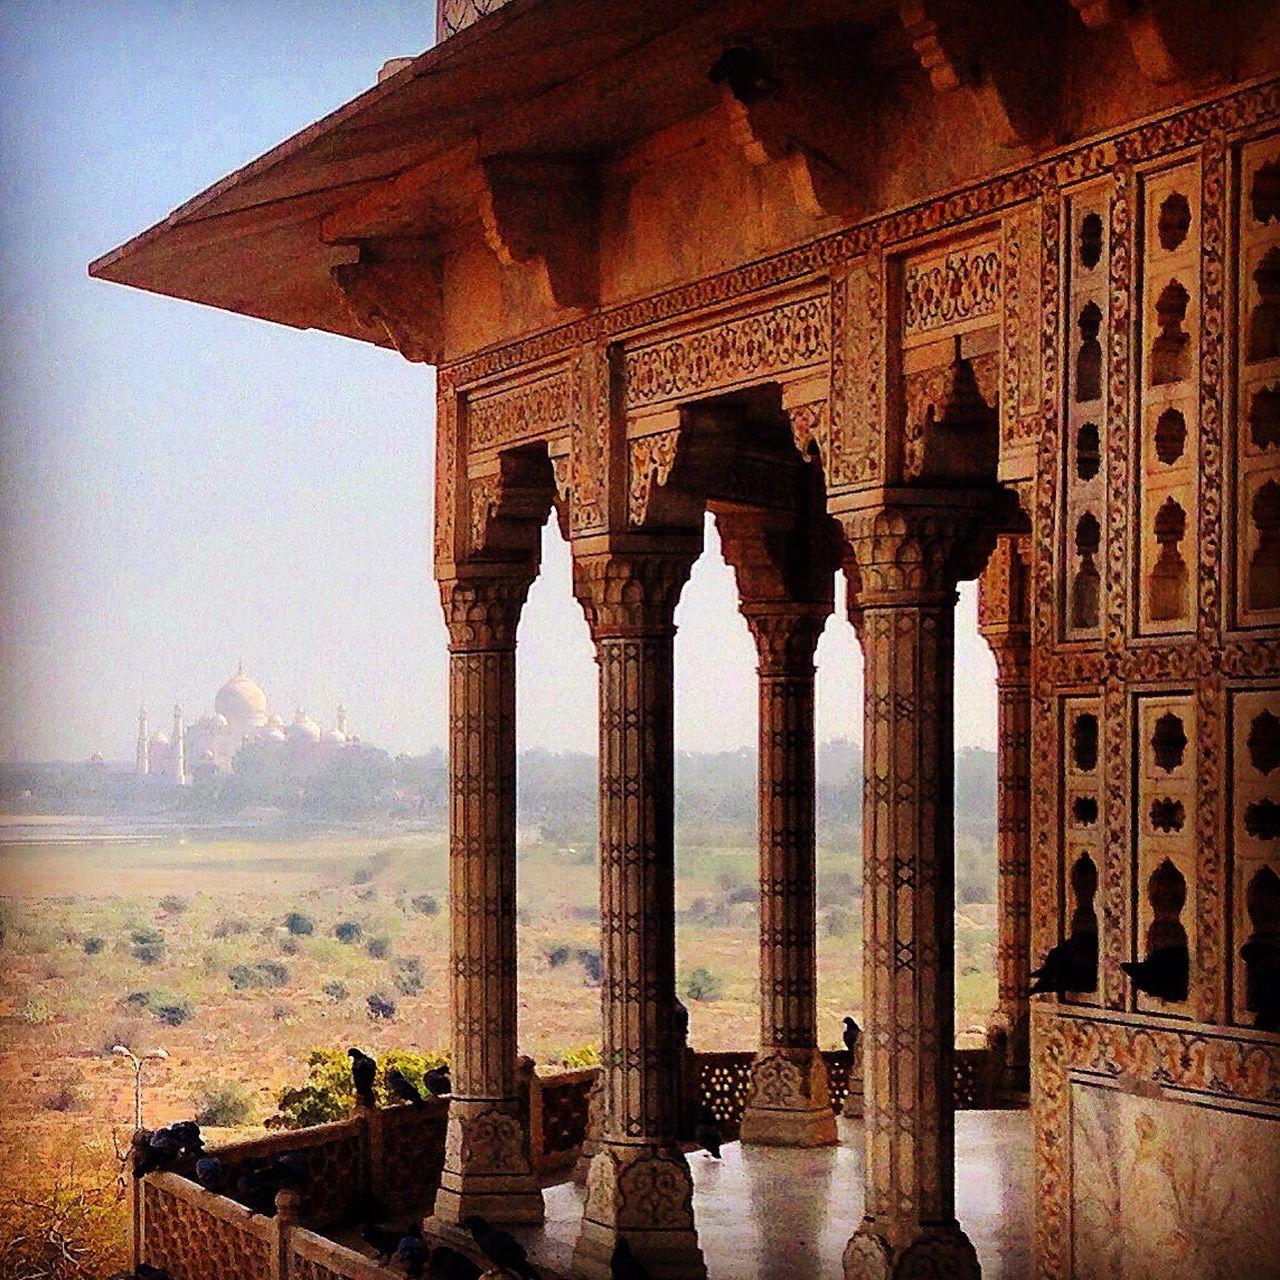 architecture, architectural column, travel destinations, built structure, history, tourism, sky, day, no people, ancient, outdoors, building exterior, nature